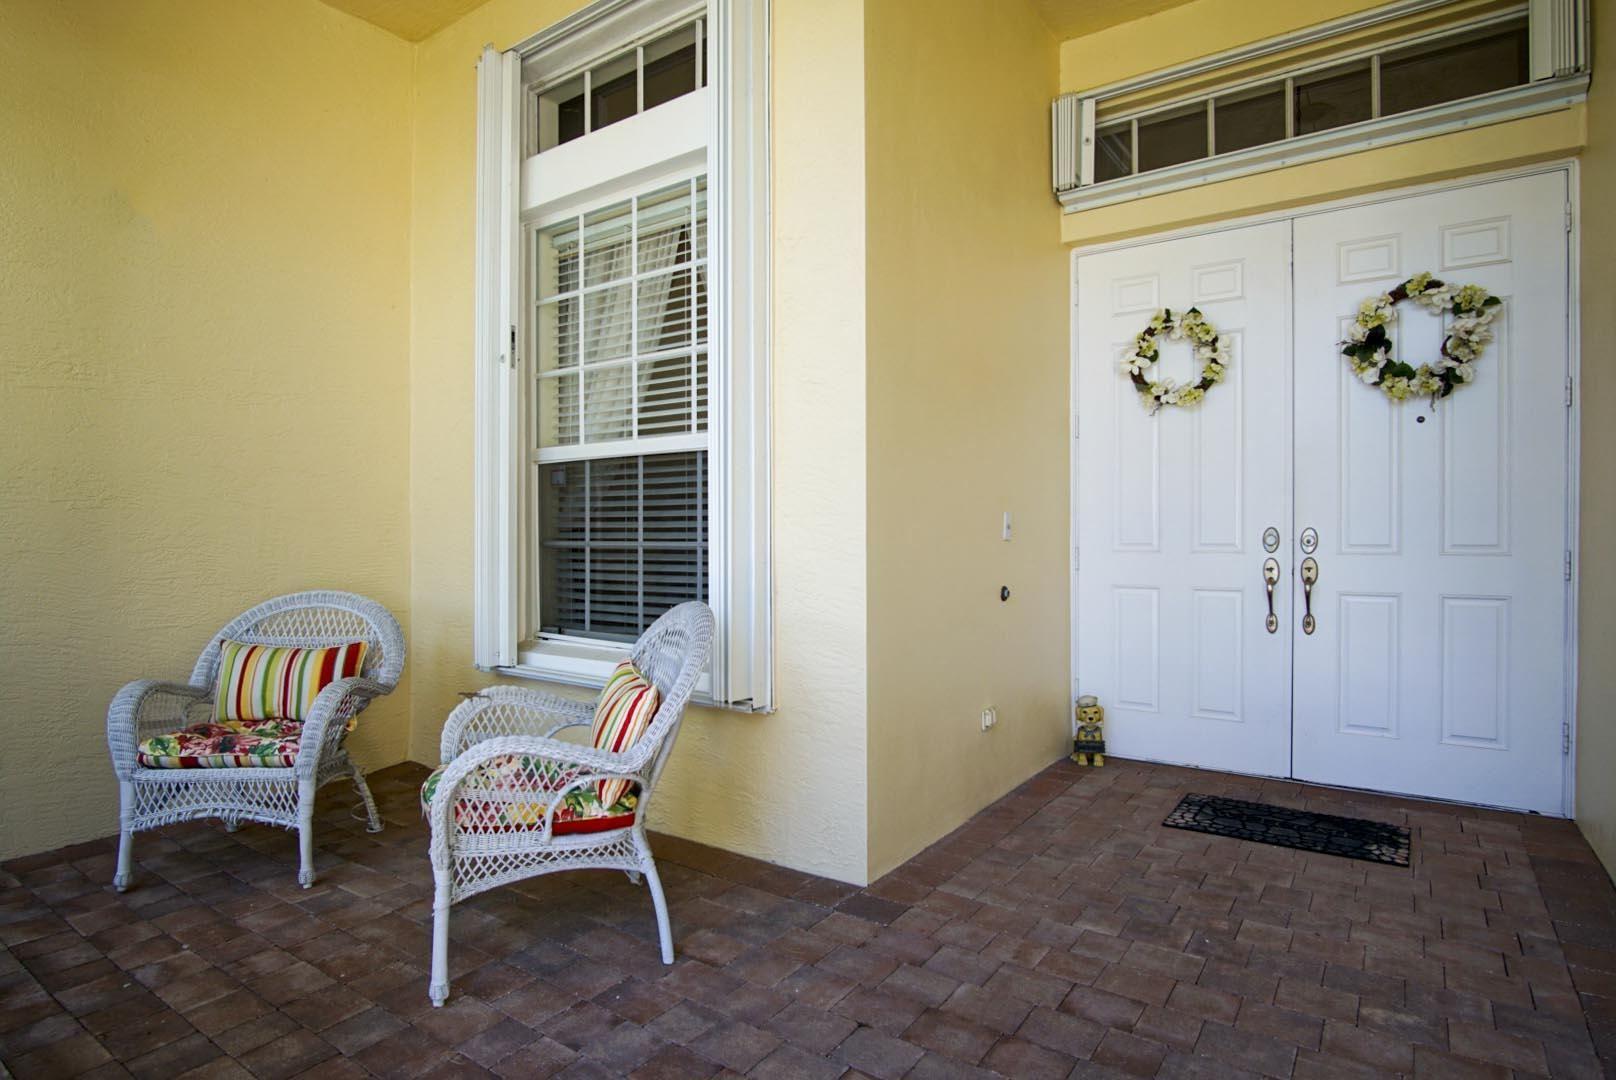 Photo of 224 Magnolia Lakes Boulevard, Port Saint Lucie, FL 34986 (MLS # RX-10635977)